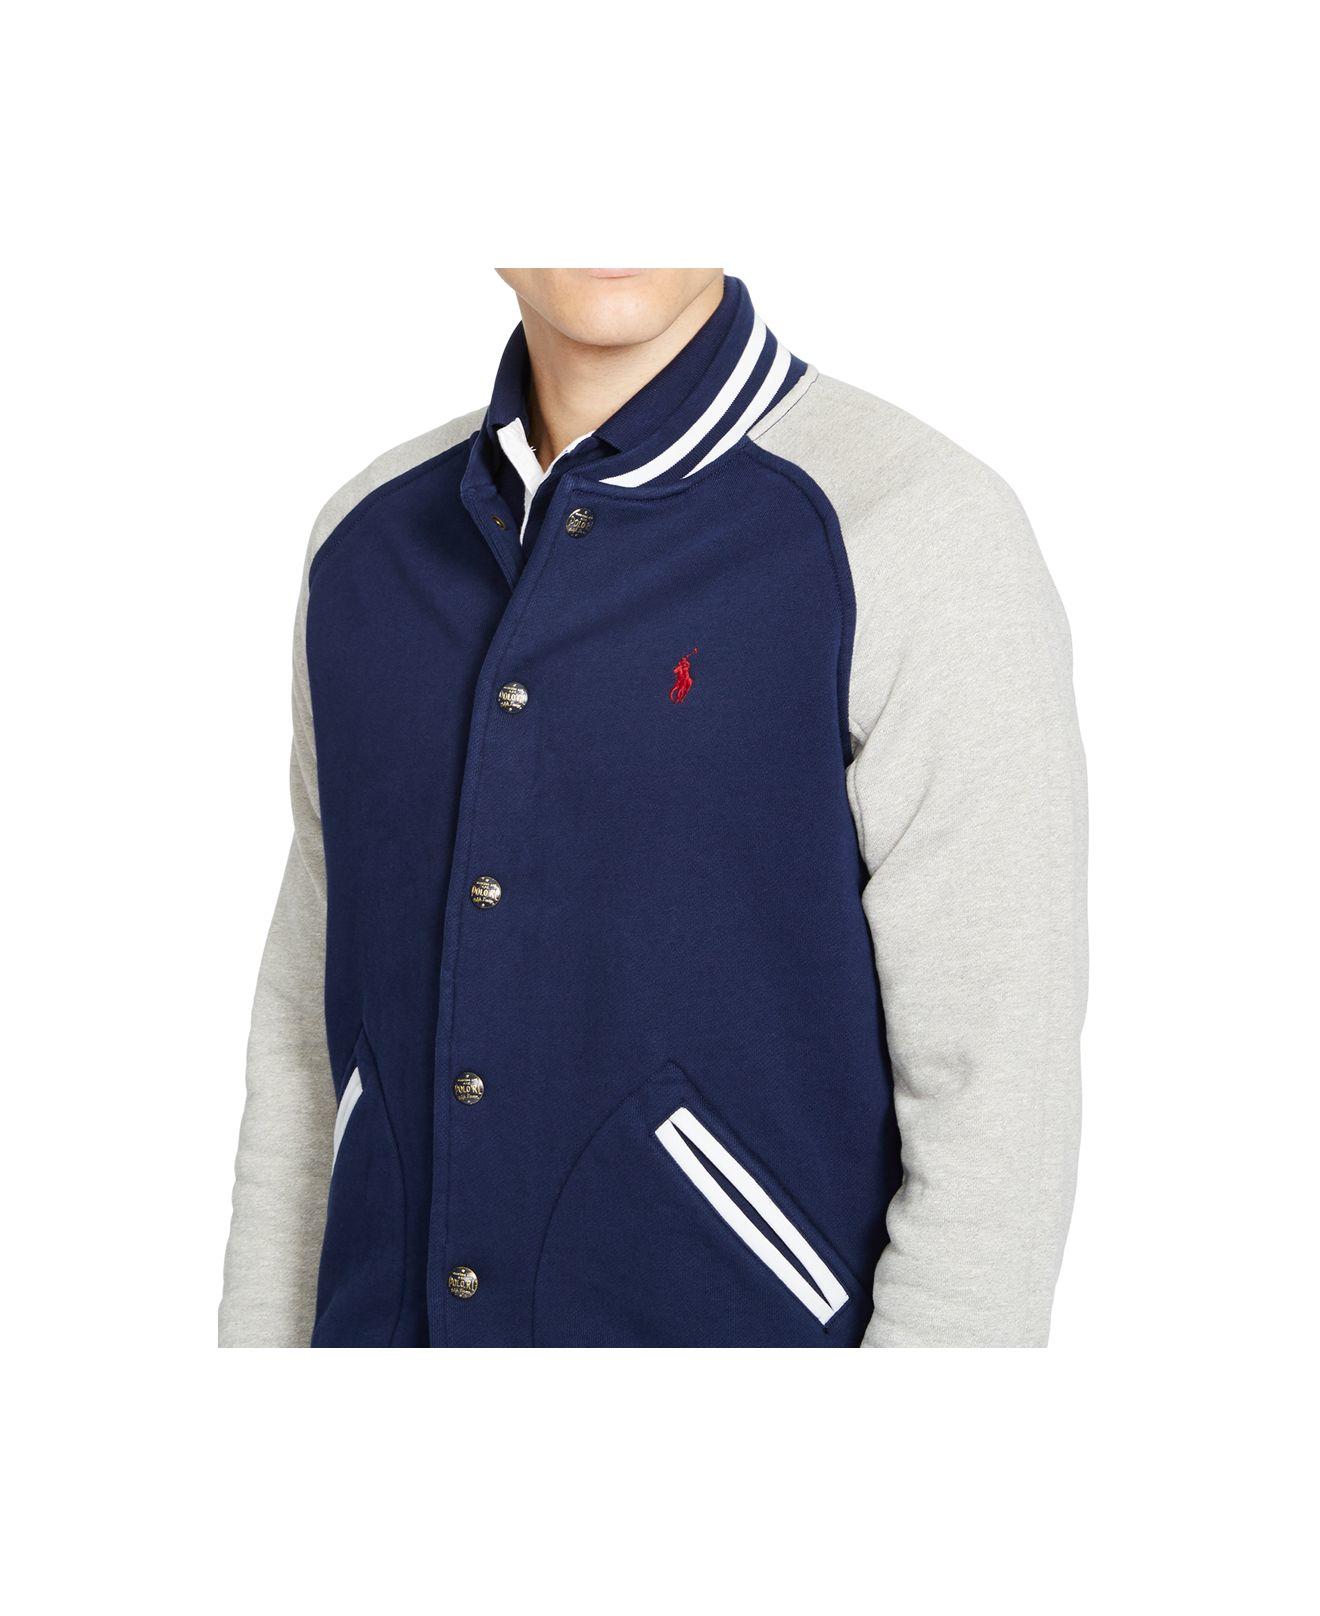 how to wear a baseball jacket